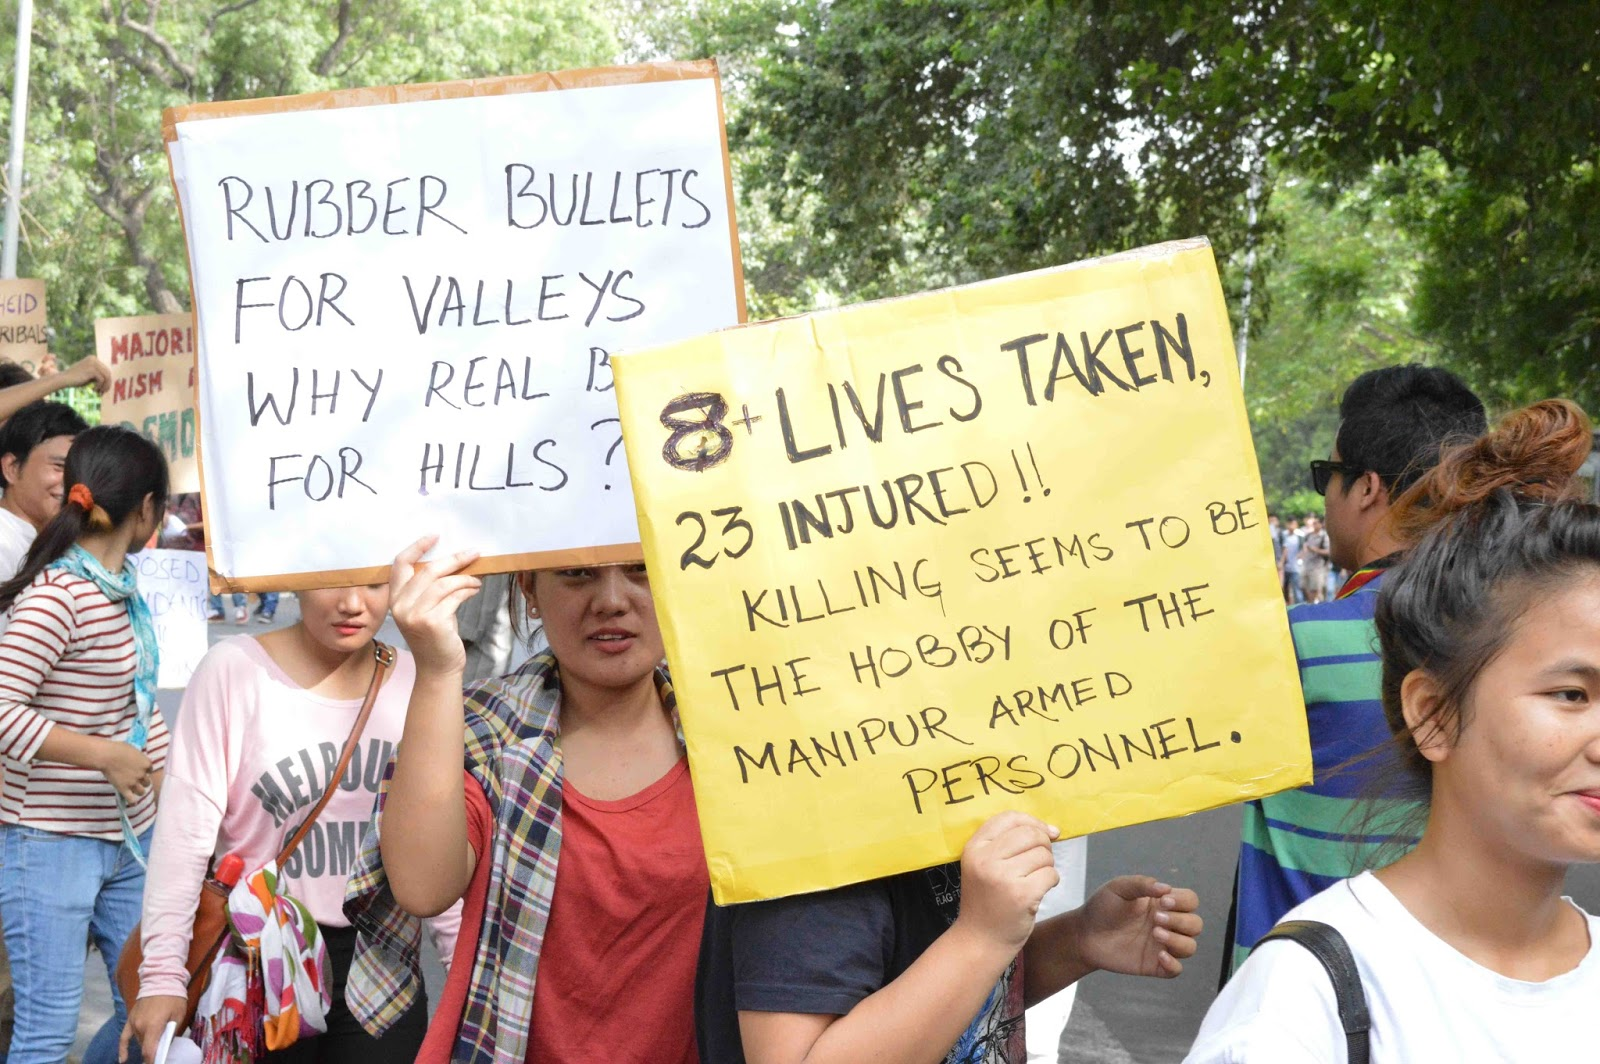 Manipur Assembly ah bill thum pass deih louh latsak na in Delhi ah protest rally neih in om